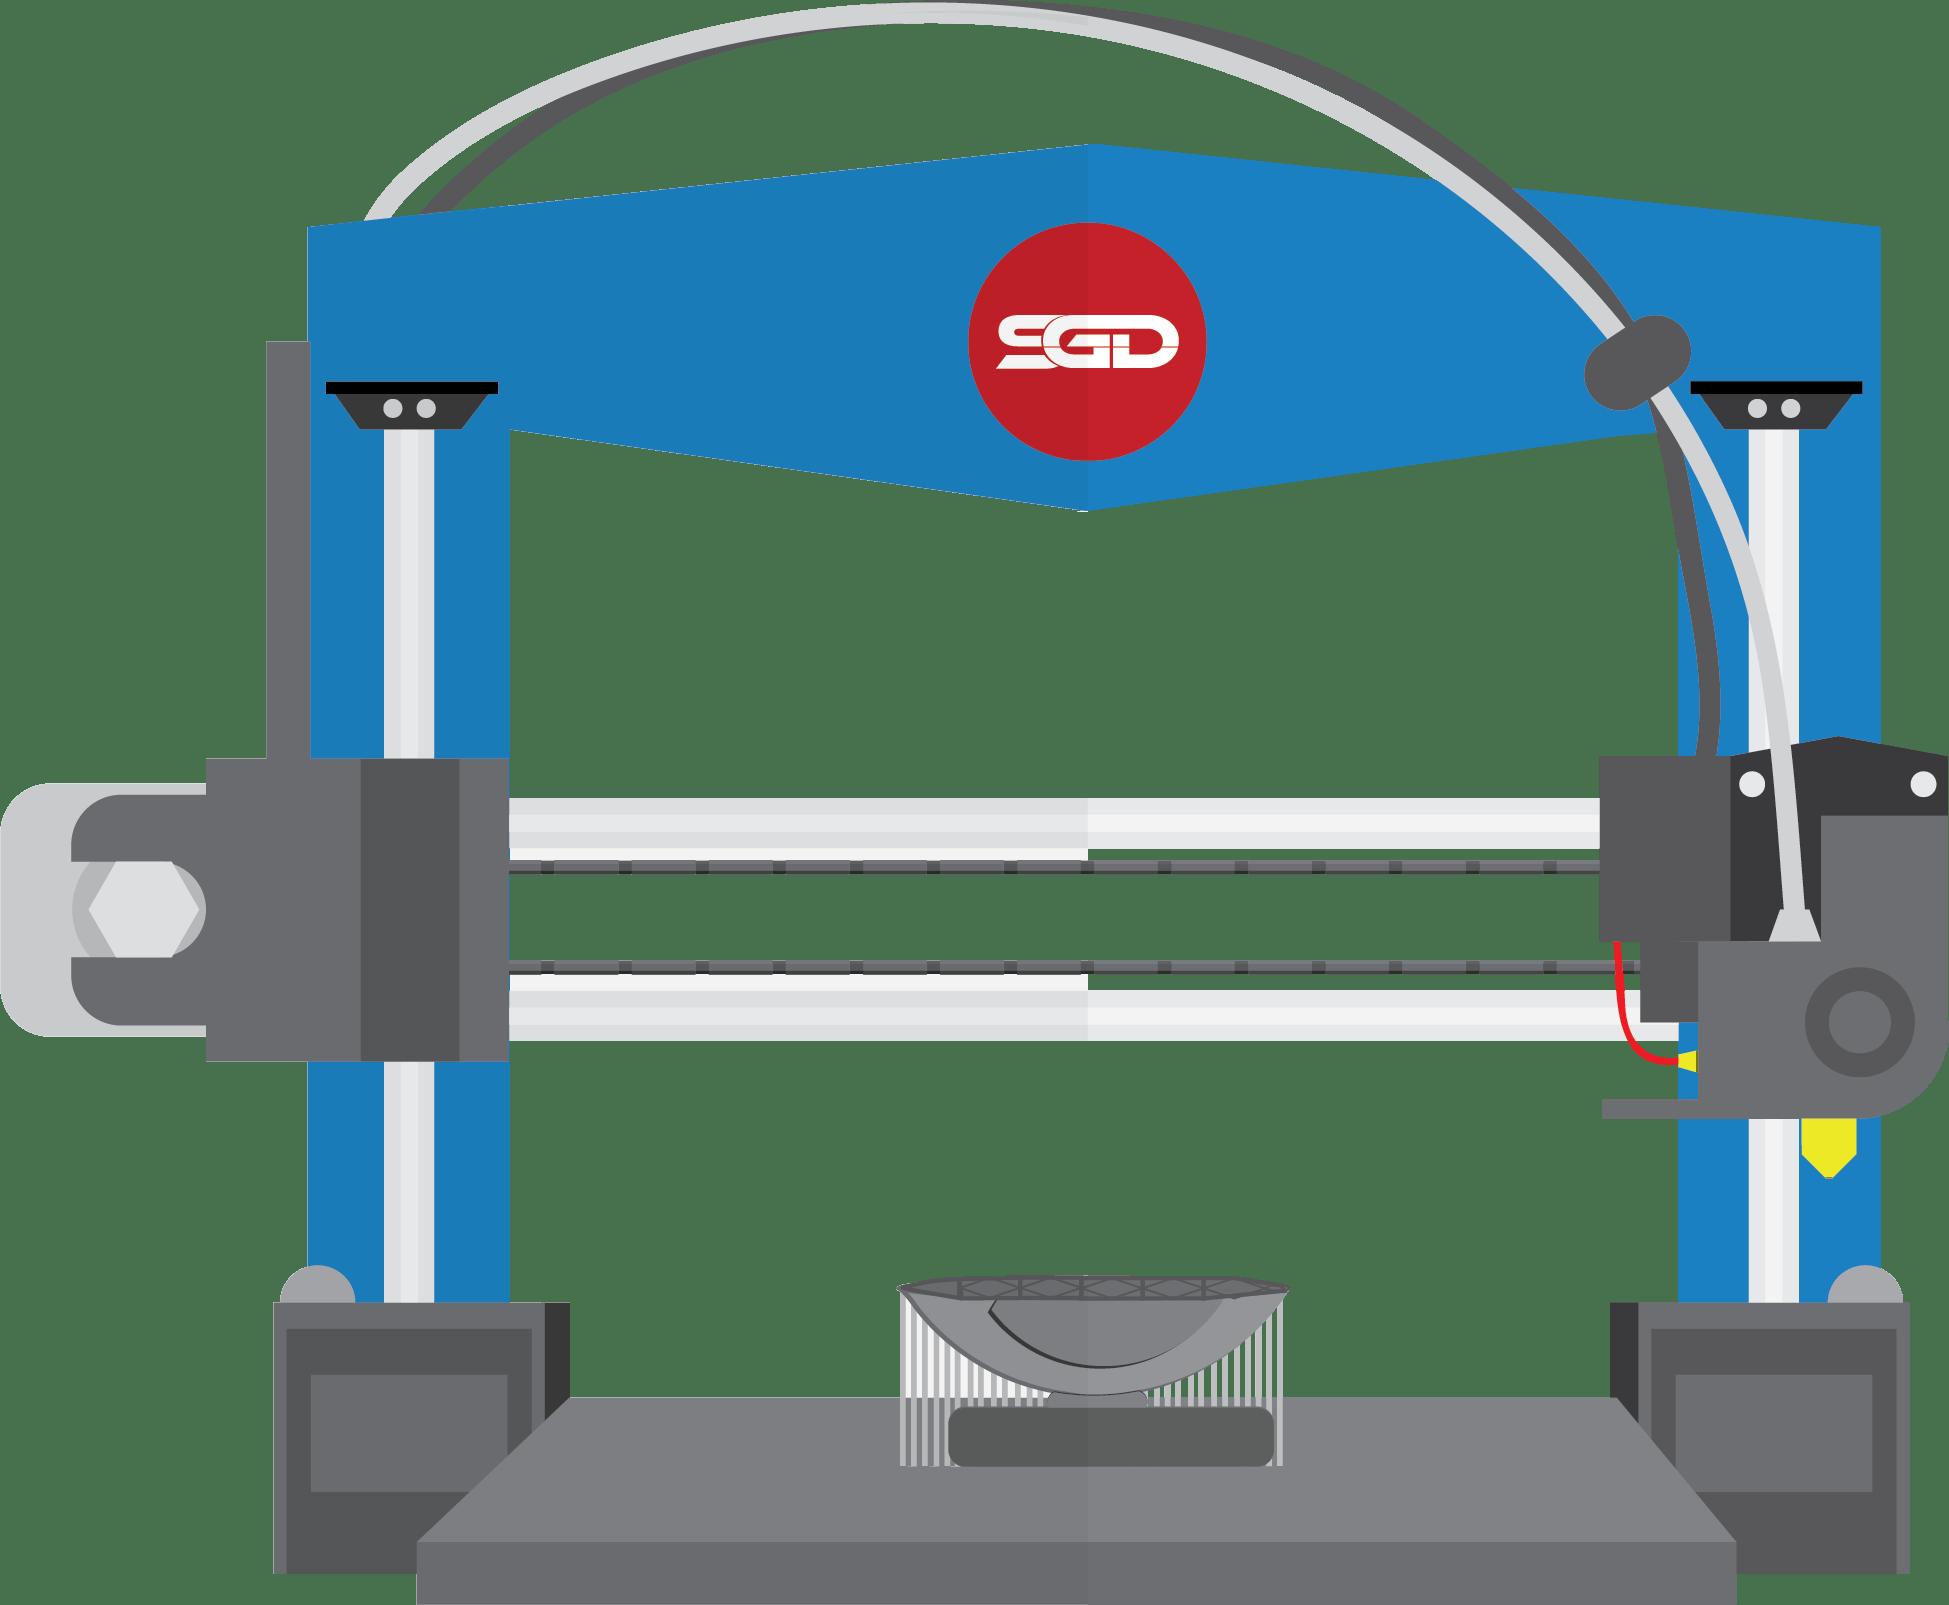 3D Printer Graphic - Capabilities